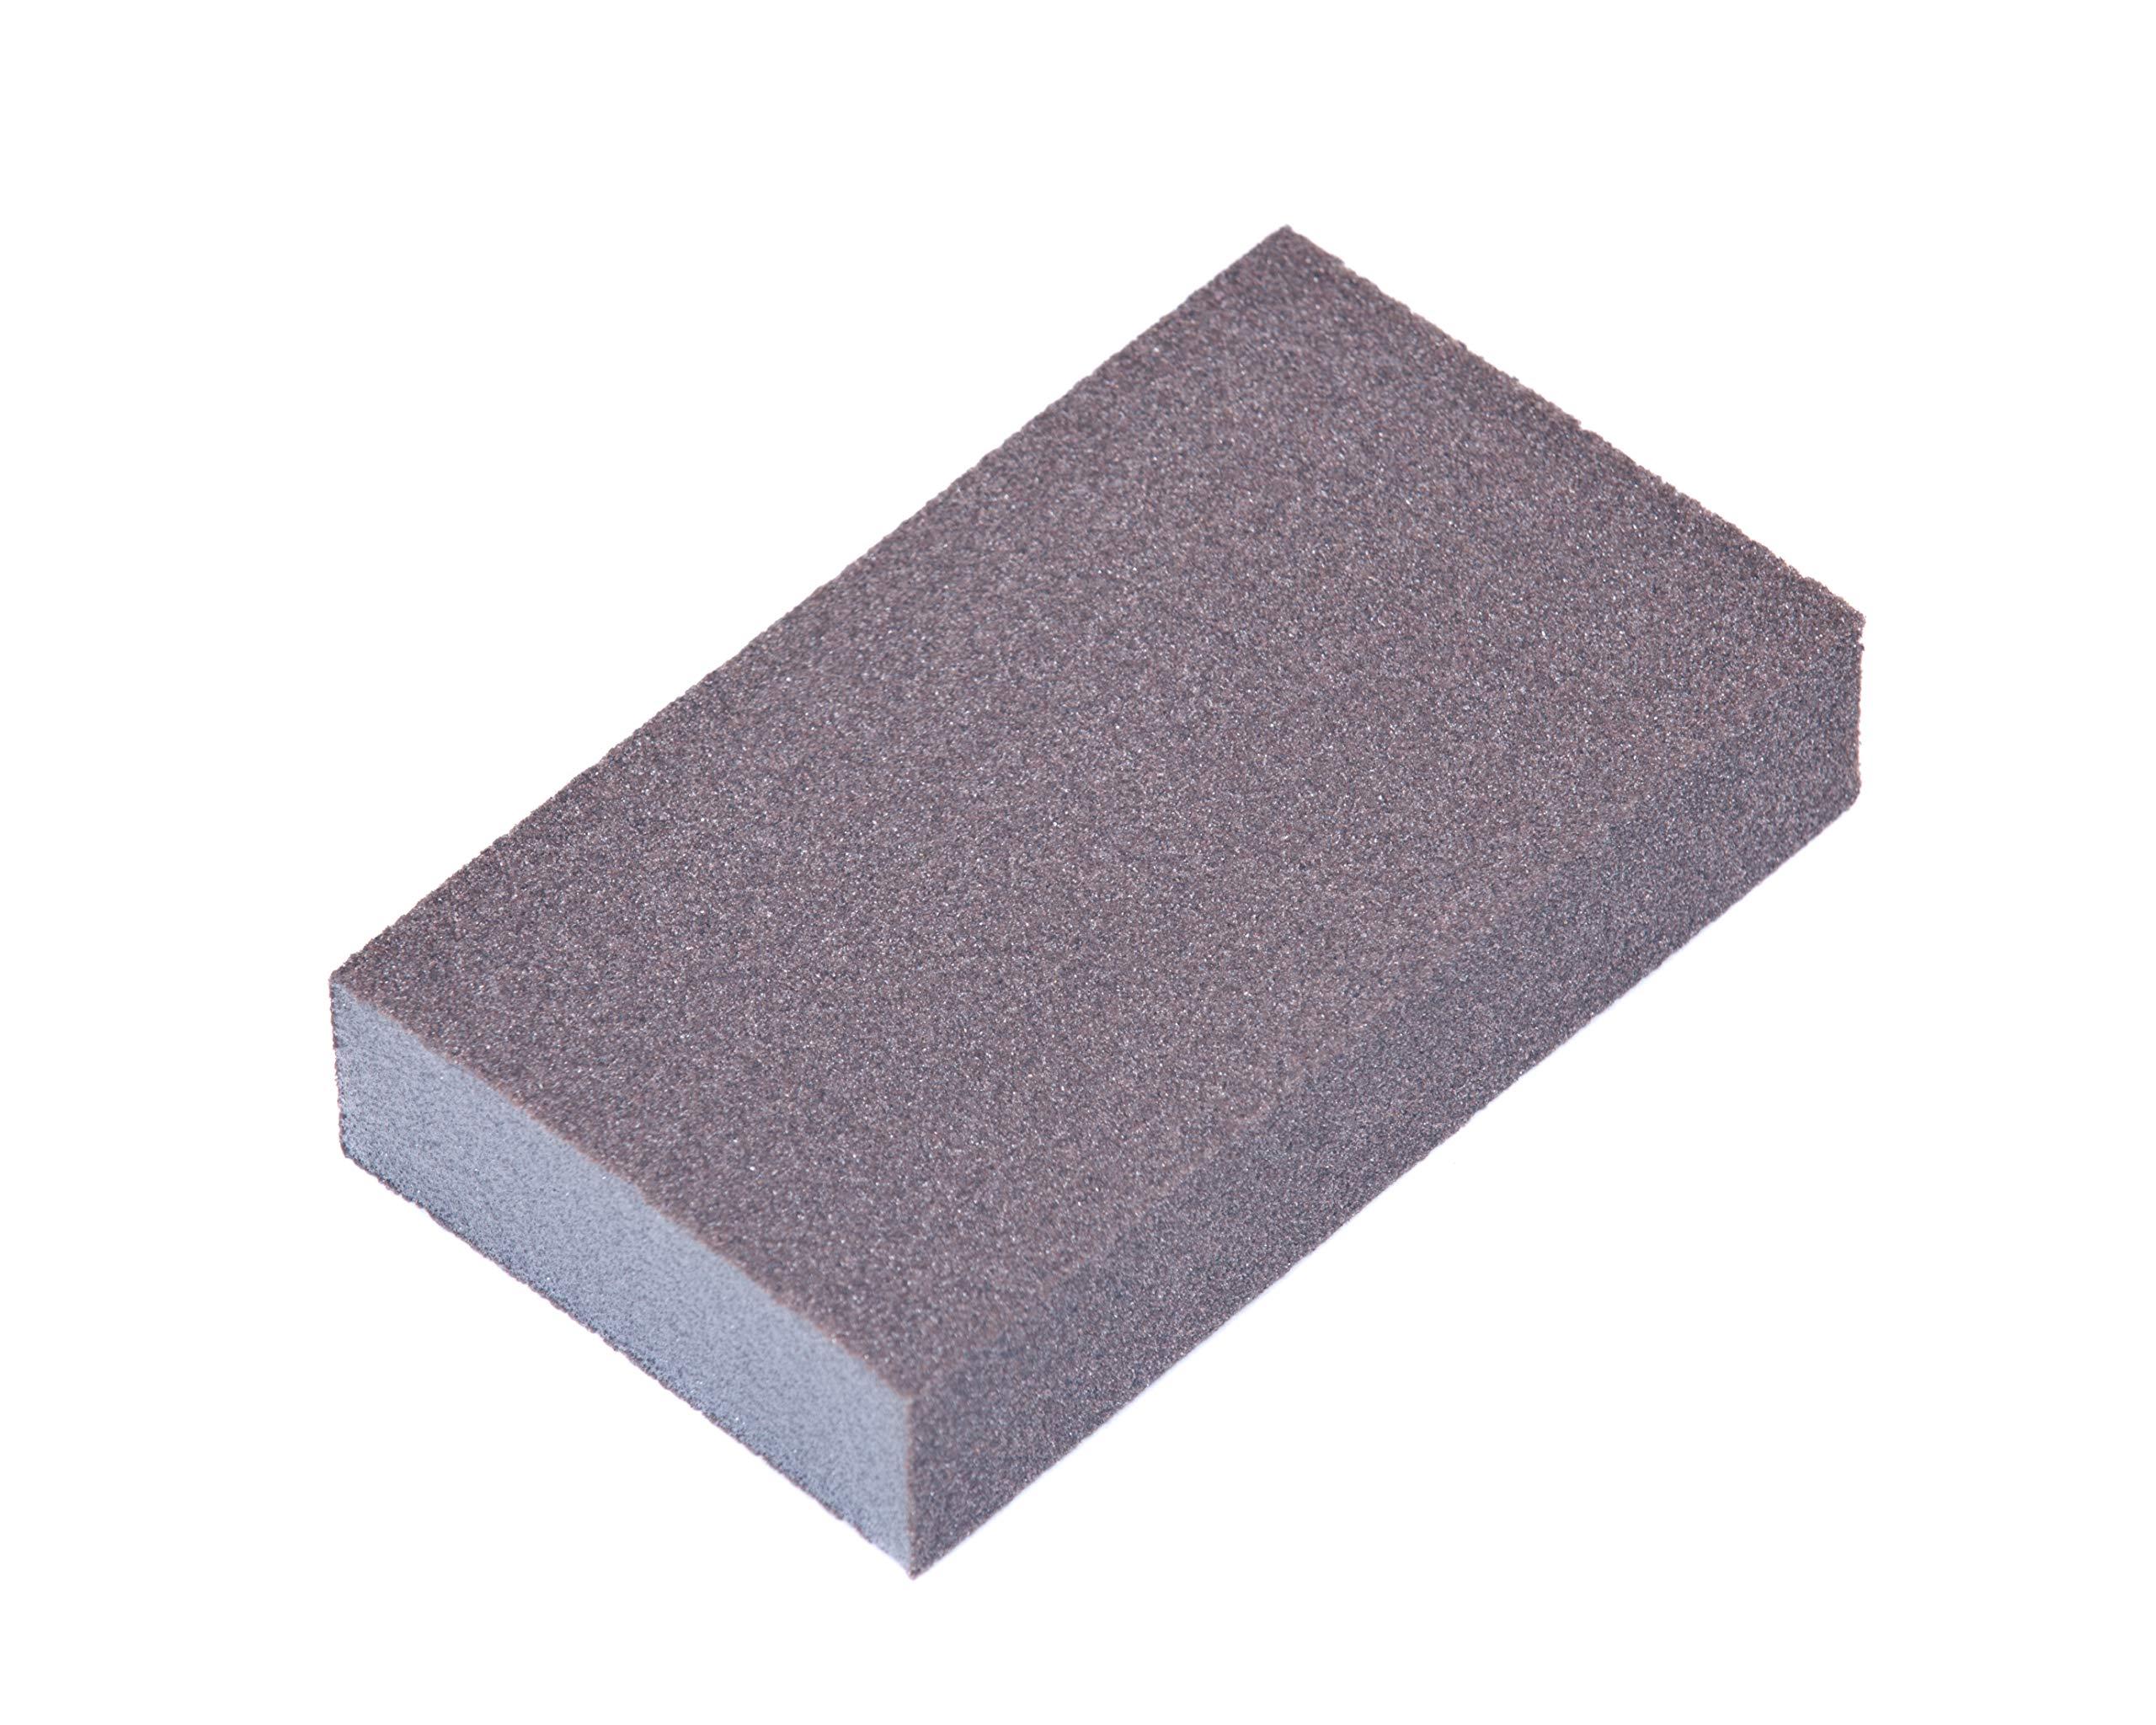 Stac Industrial 3'' x 4'' x 1/2'' 2-Sided Sealer Sanding Sponge - 130 Pieces Per Box